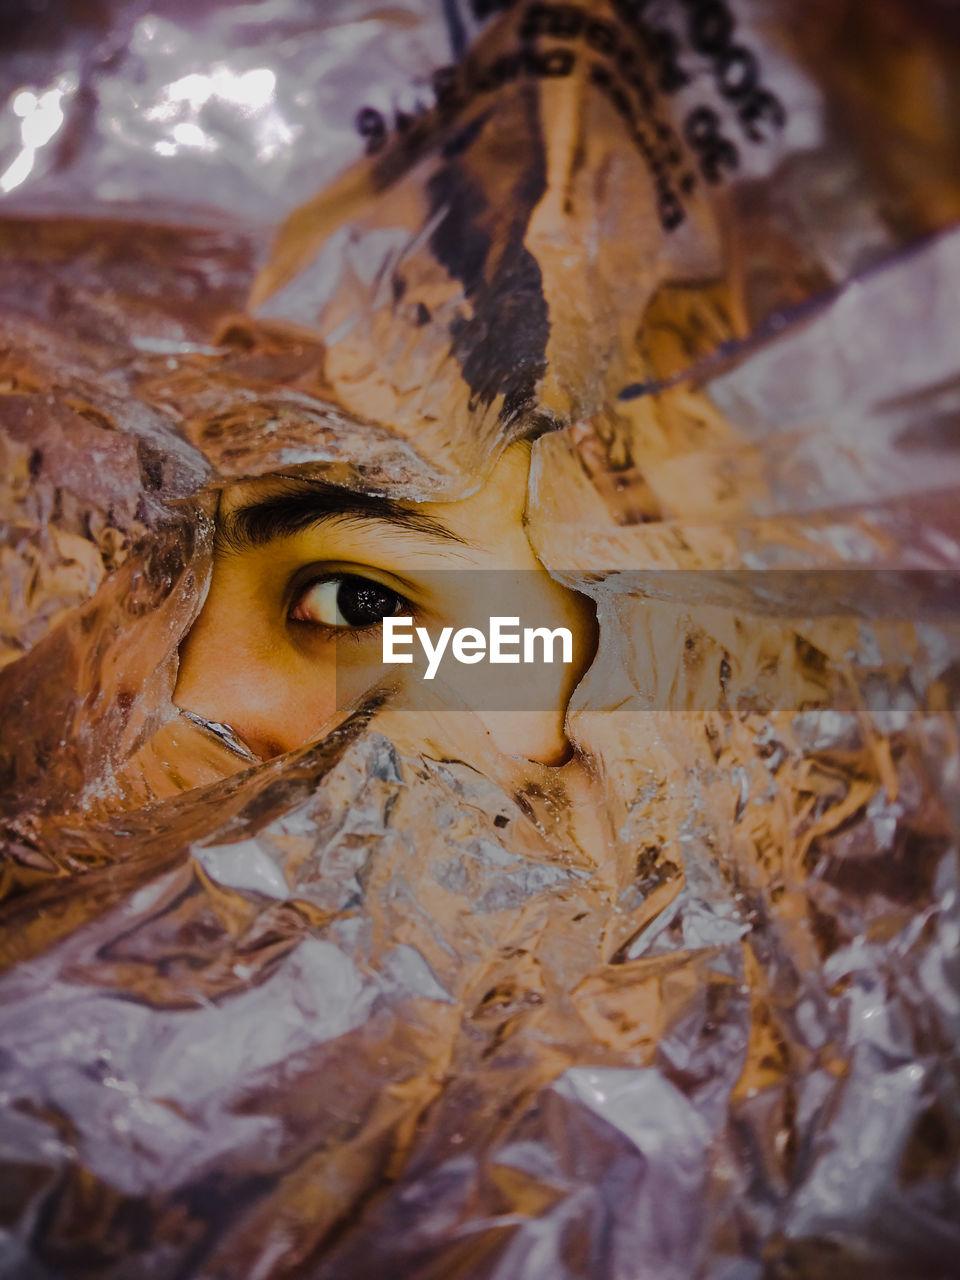 Close-up of human eye seen through foil